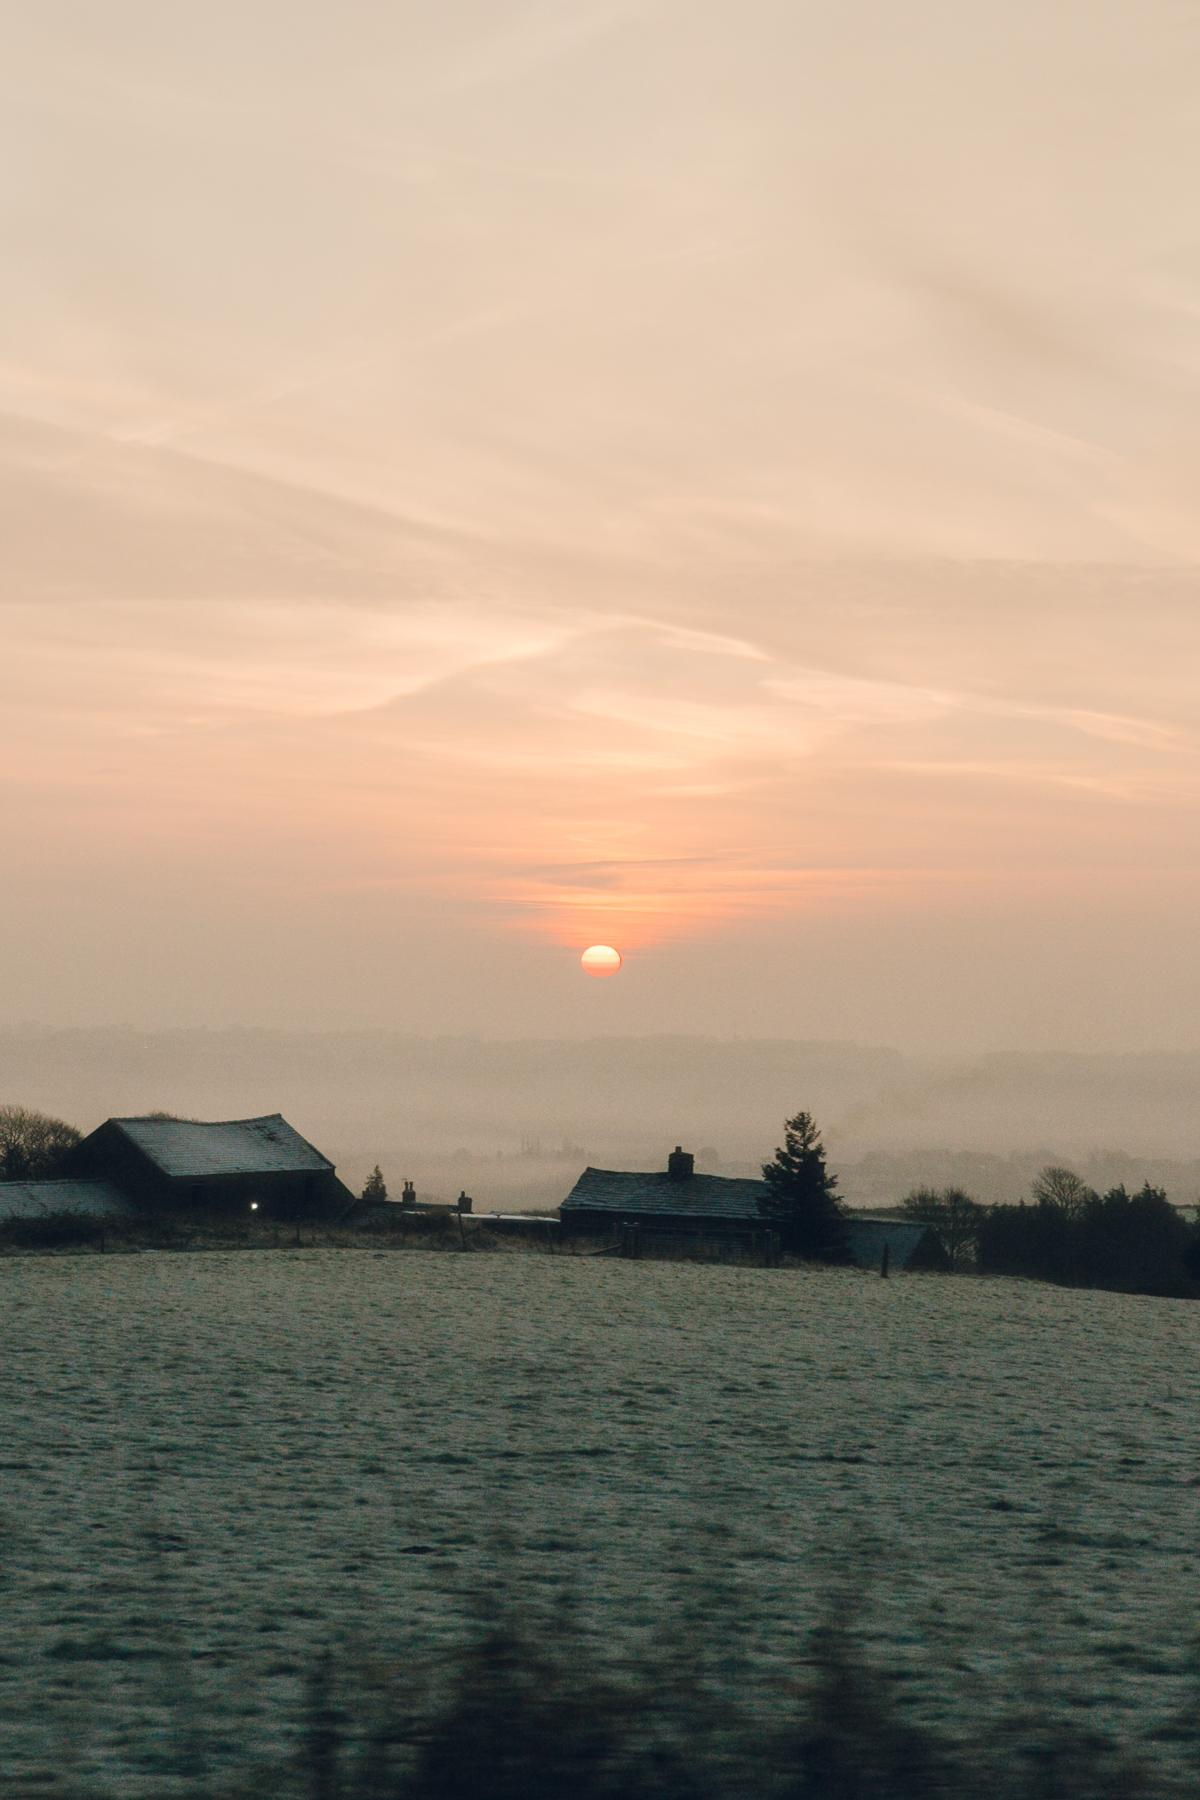 Sunrise over Derbyshire fields in the Winter.